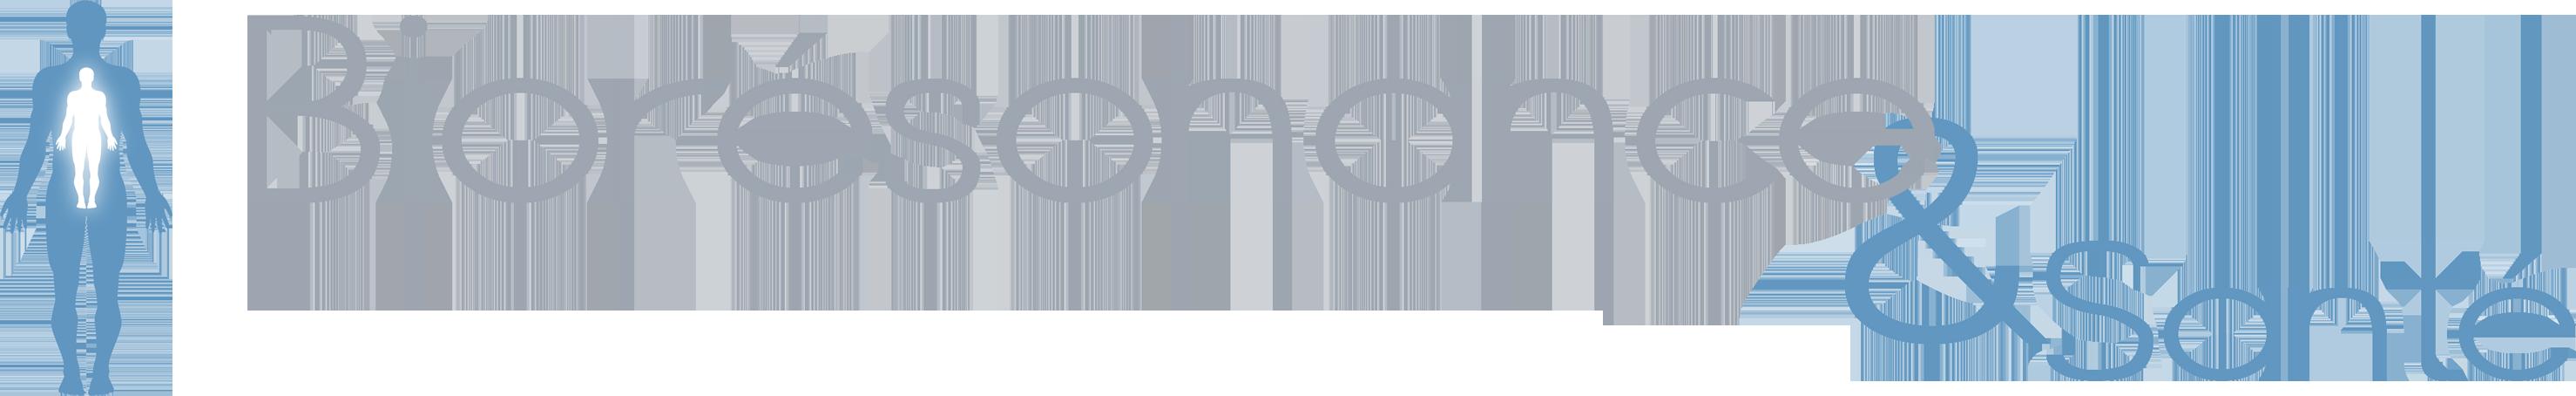 logo-bioresonance-sante-bilan-global-1.png